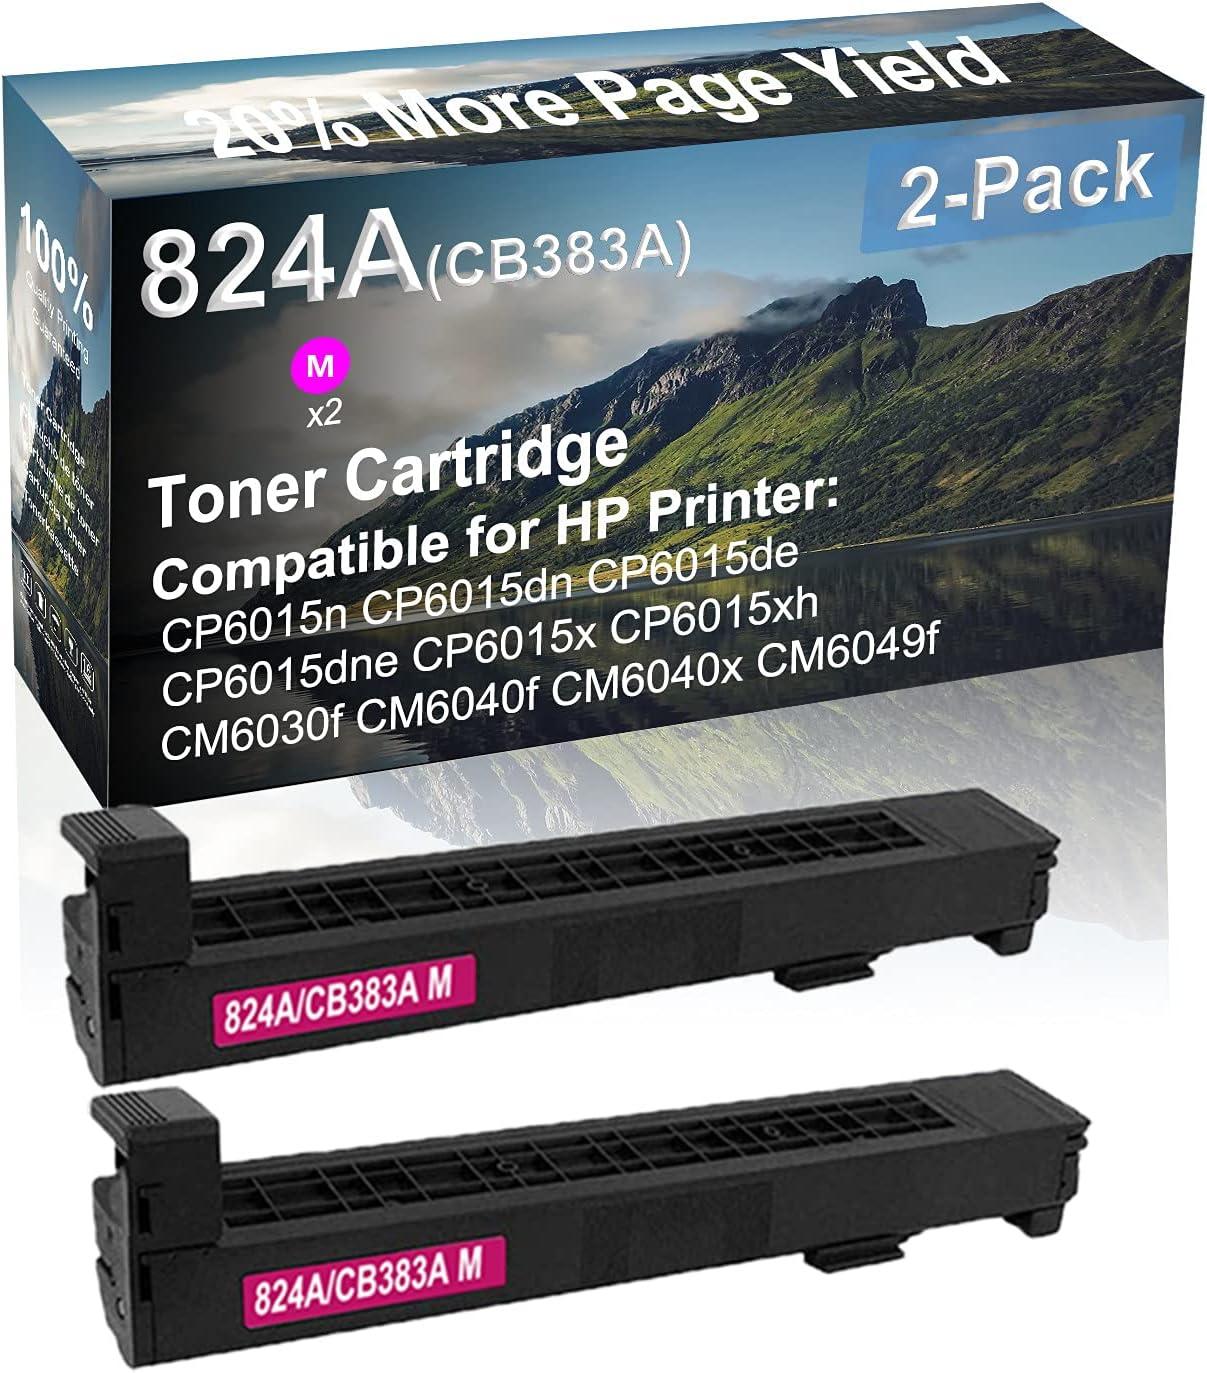 2-Pack (Magenta) Compatible High Yield 824A (CB383A) Laser Printer Toner Cartridge use for HP CM6030f CM6040f CM6040x CM6049f Printer